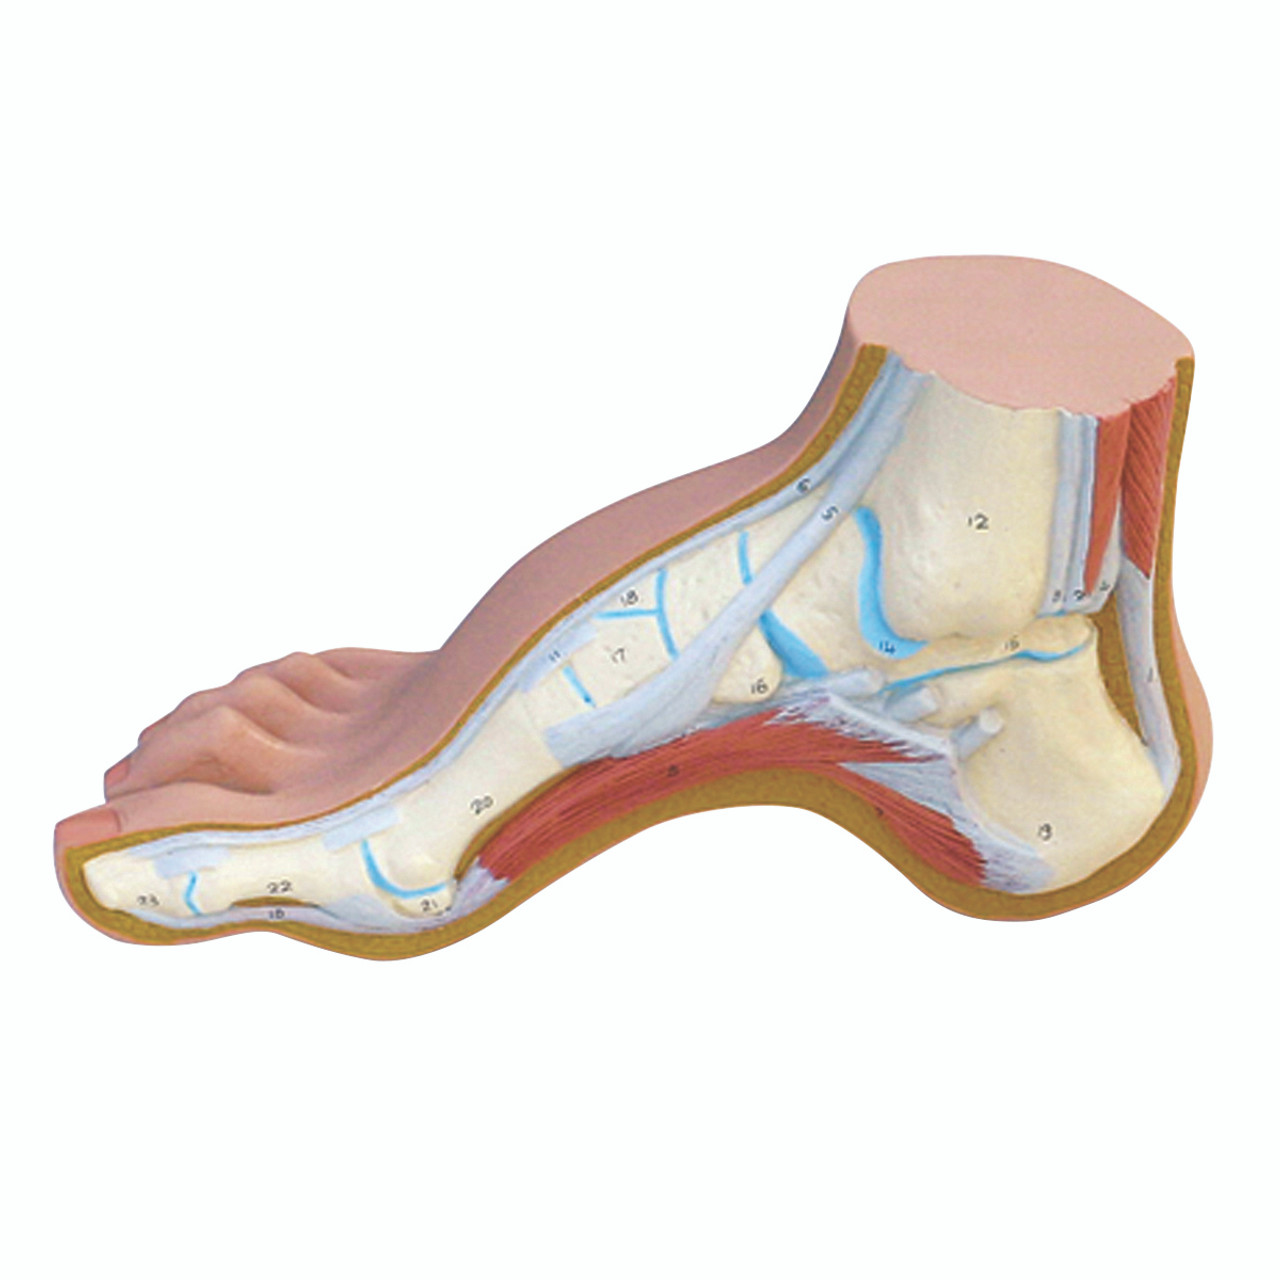 Anatomical Model - Hollow Foot (Pes Cavus)